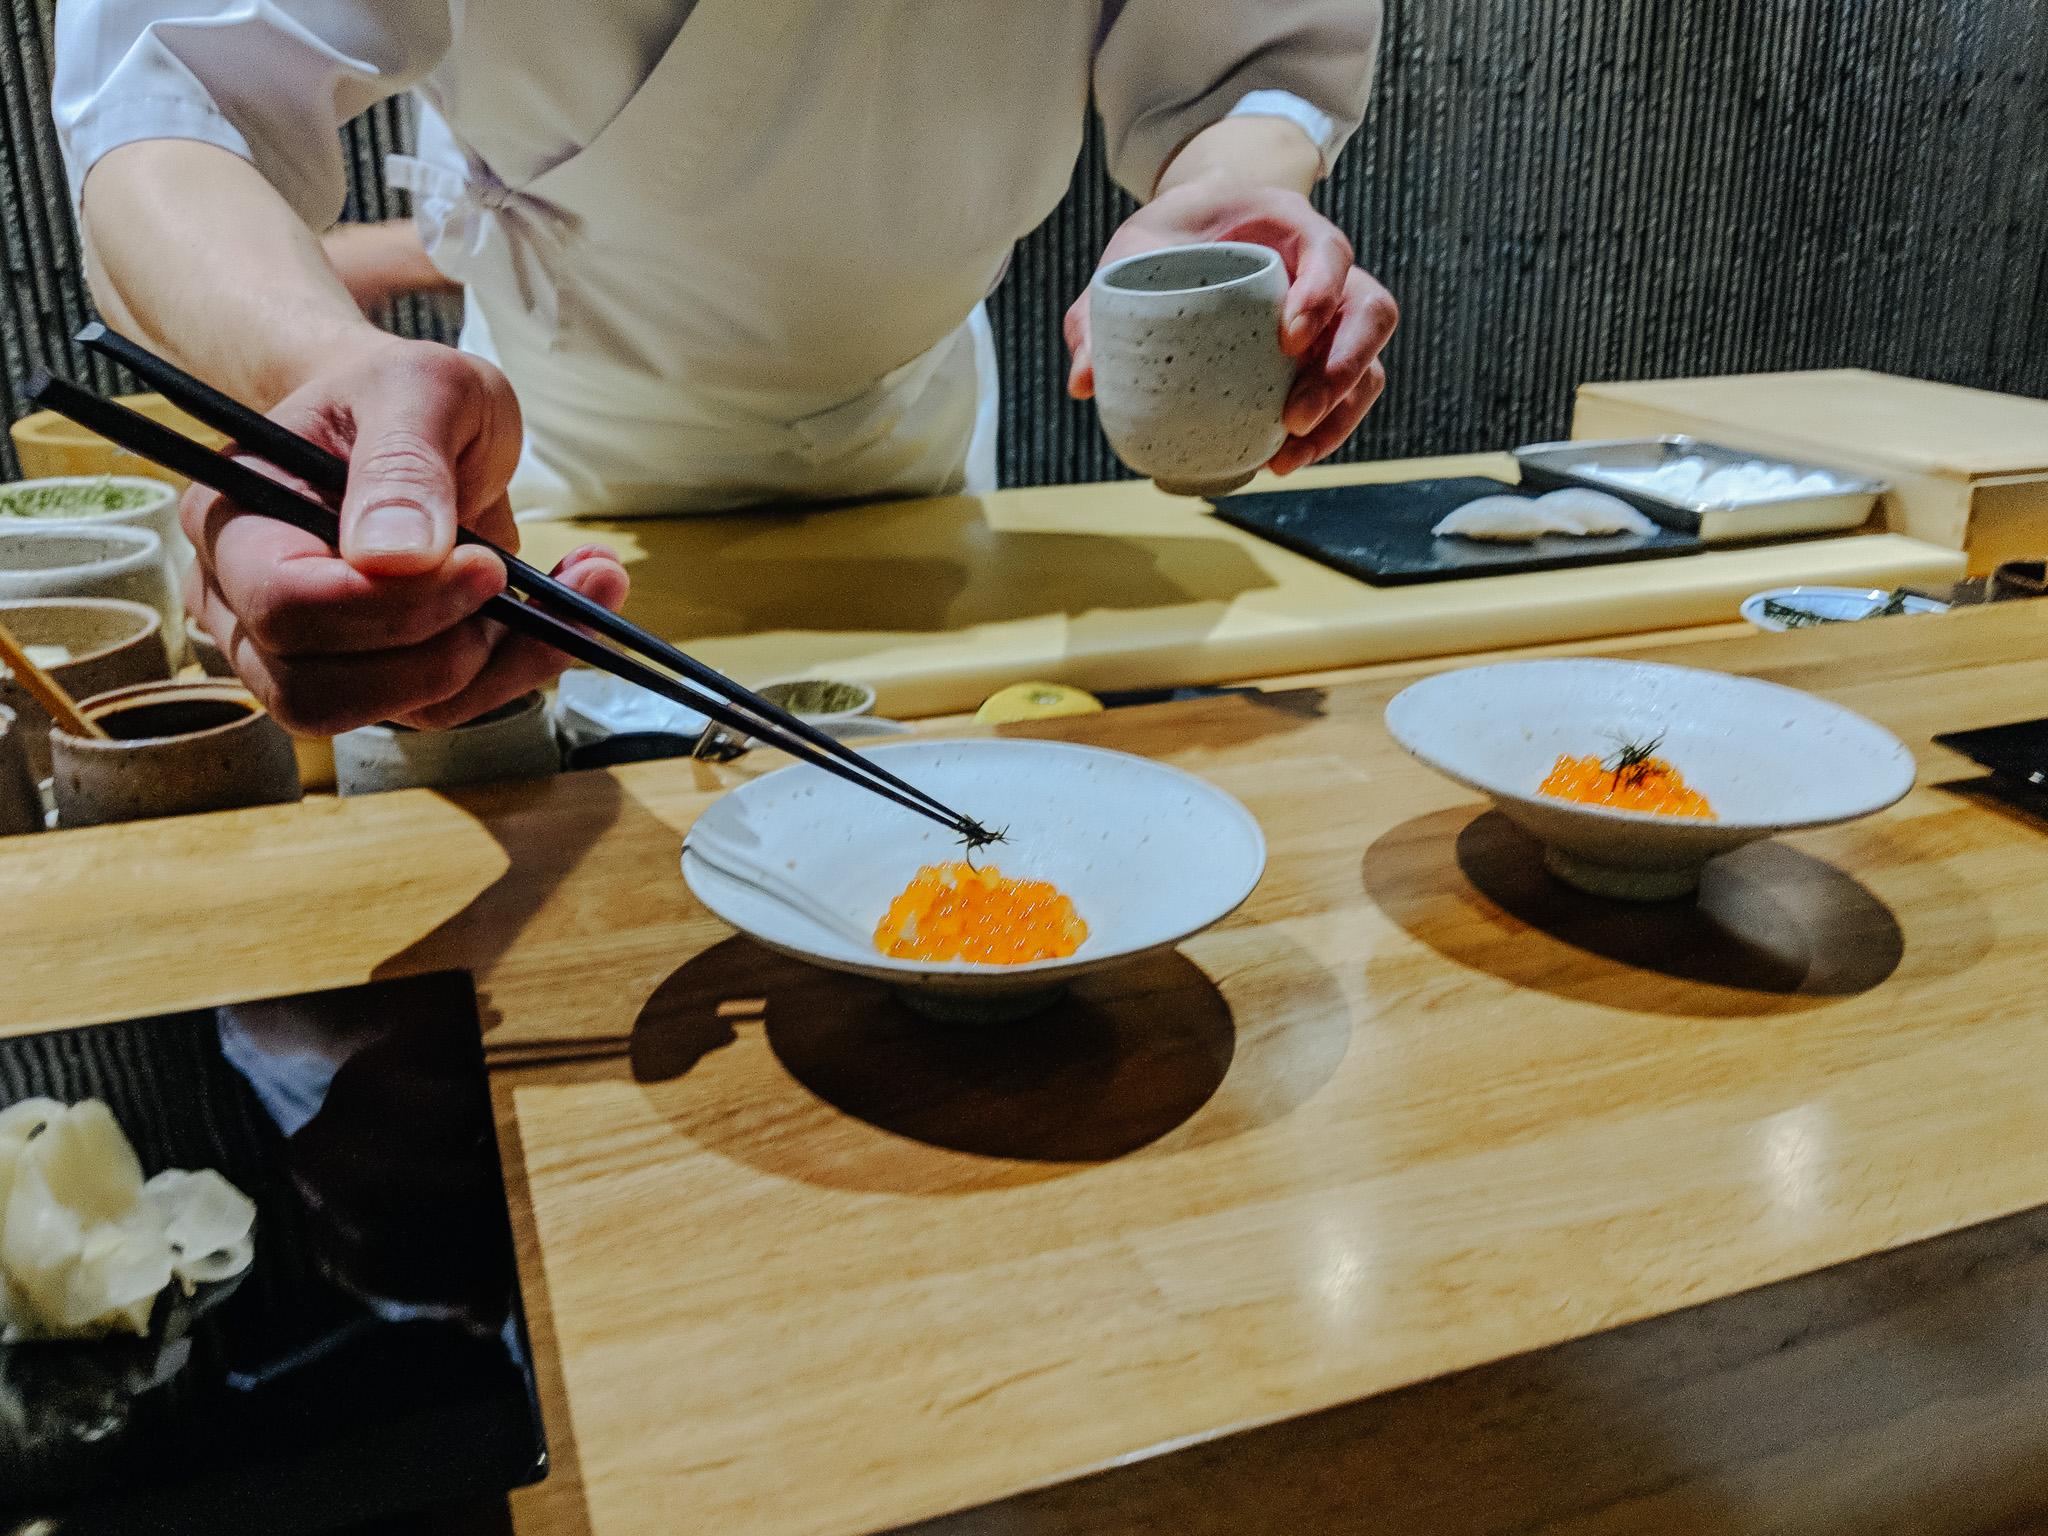 minamishima-melbourne-food-photographer-018.JPG